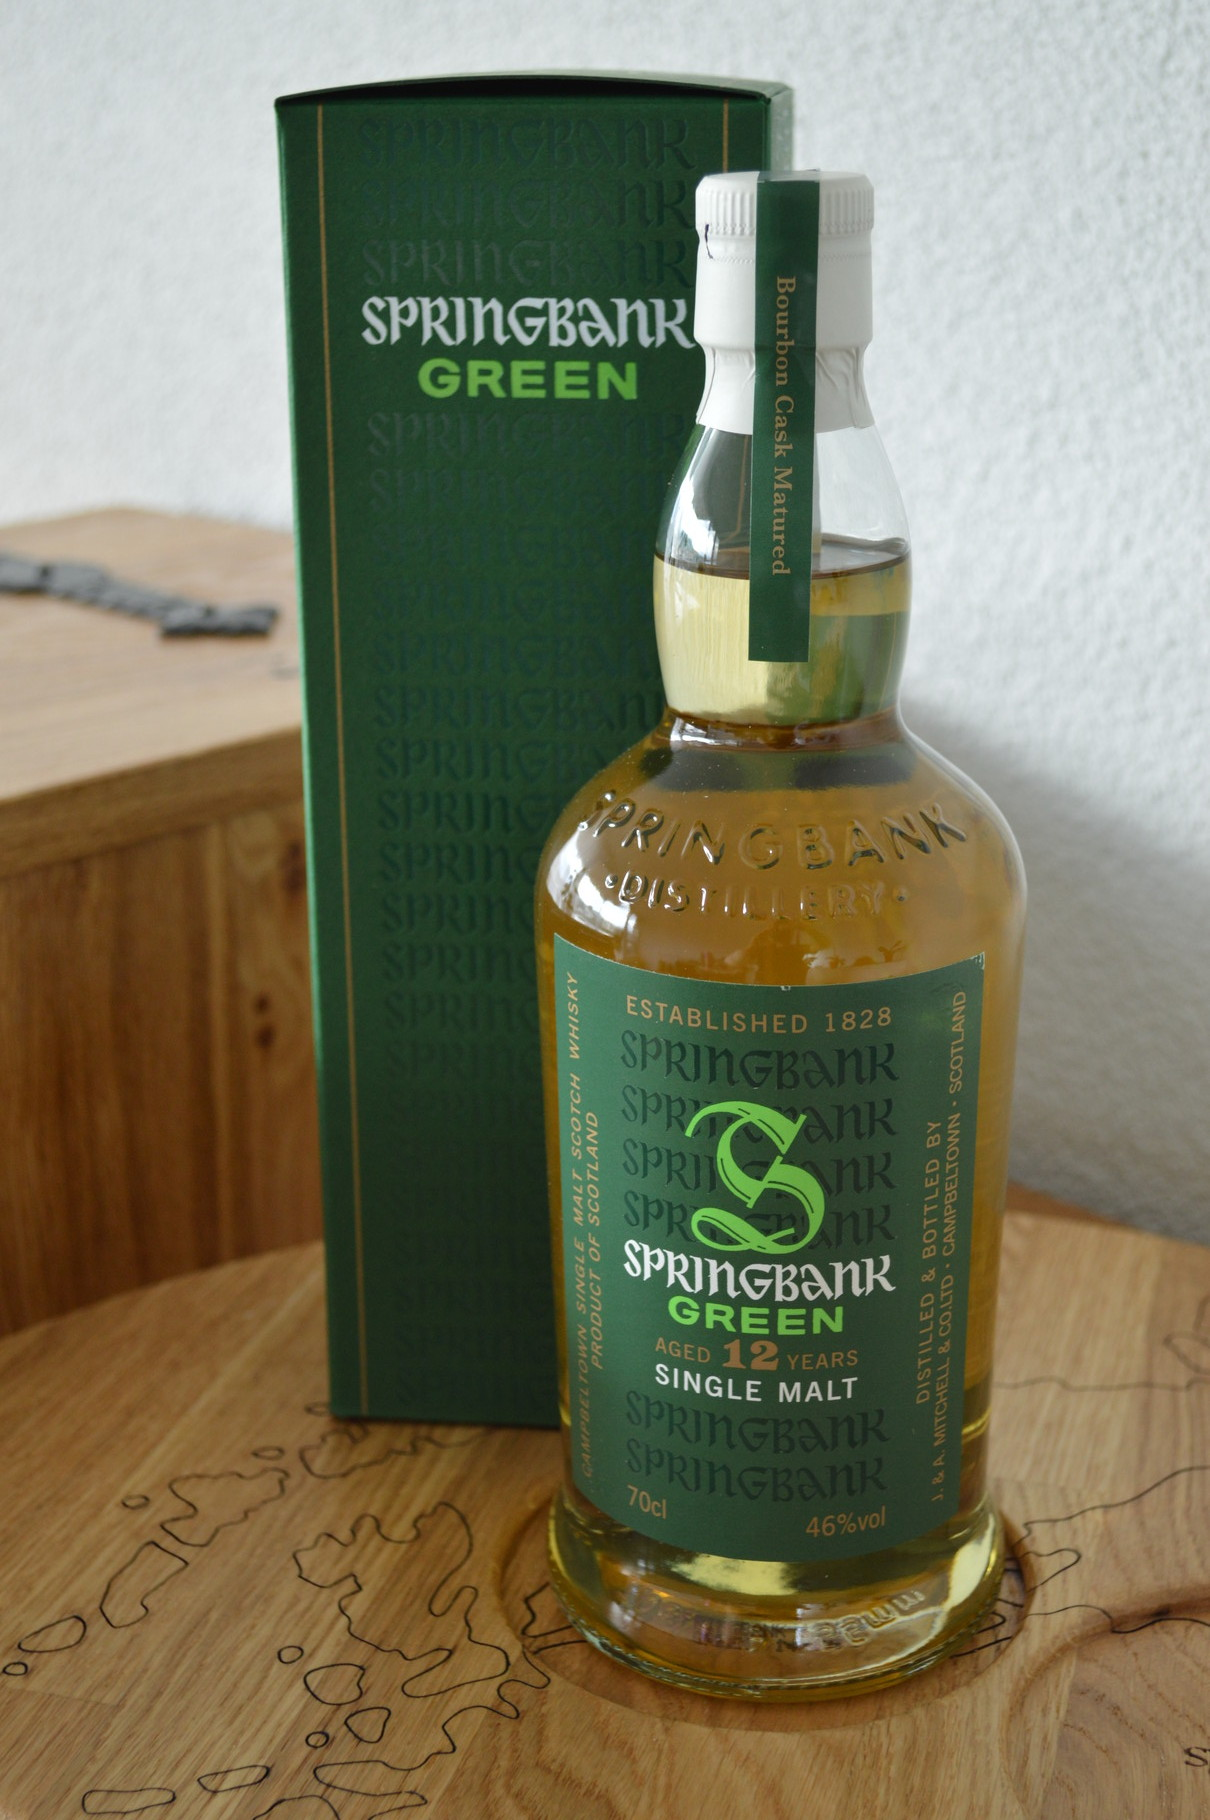 CAMPBELTOWN - Springbank* - Age: 12 years - Bottler: Original - 70cl - 46% - Green